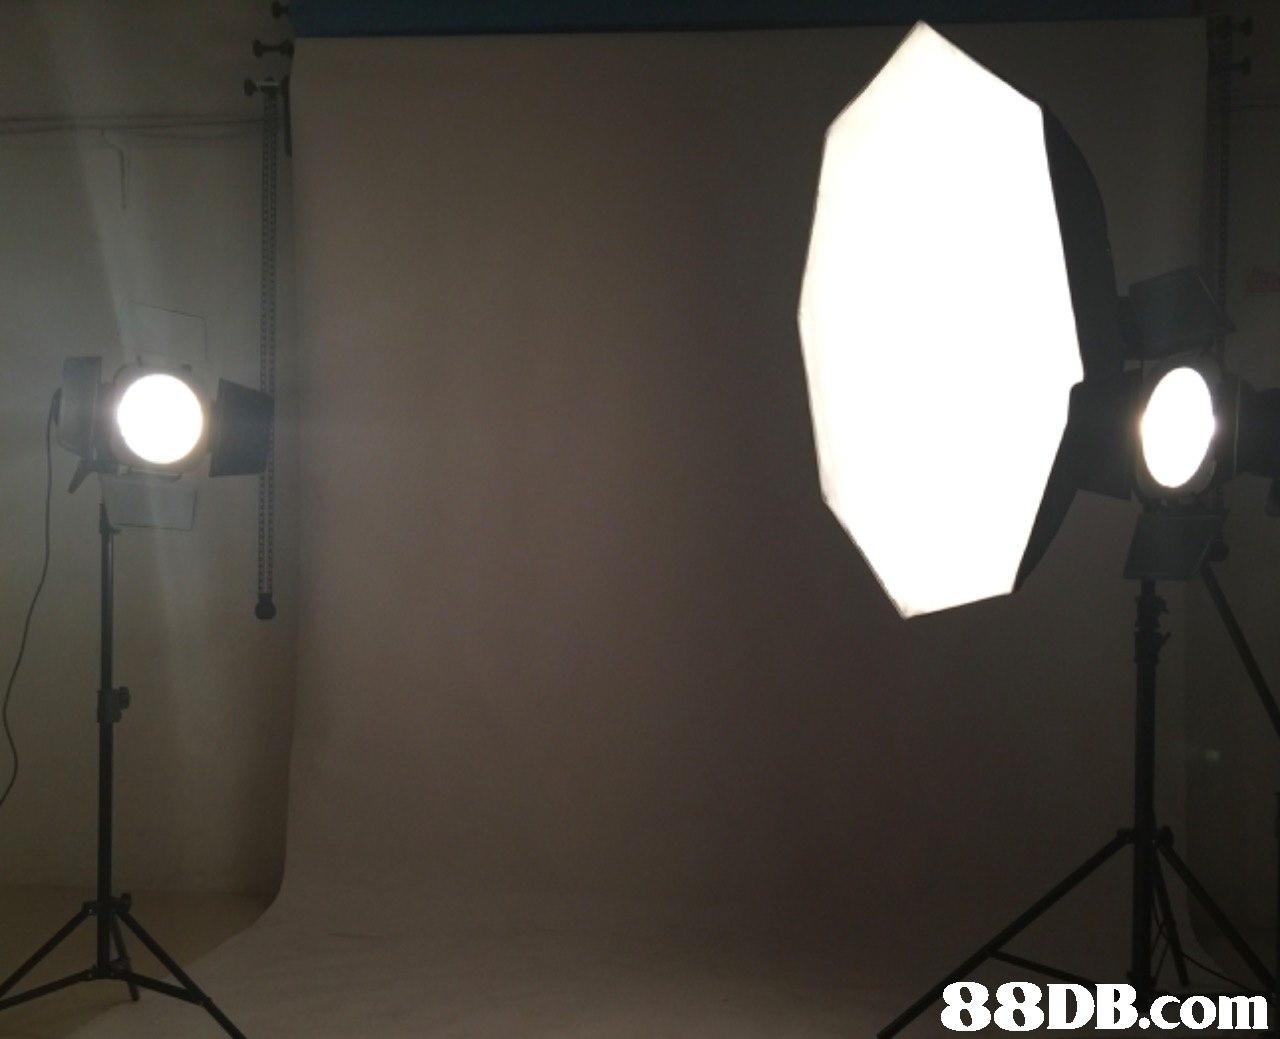 Lighting,Light,Light fixture,Lamp,Lighting accessory